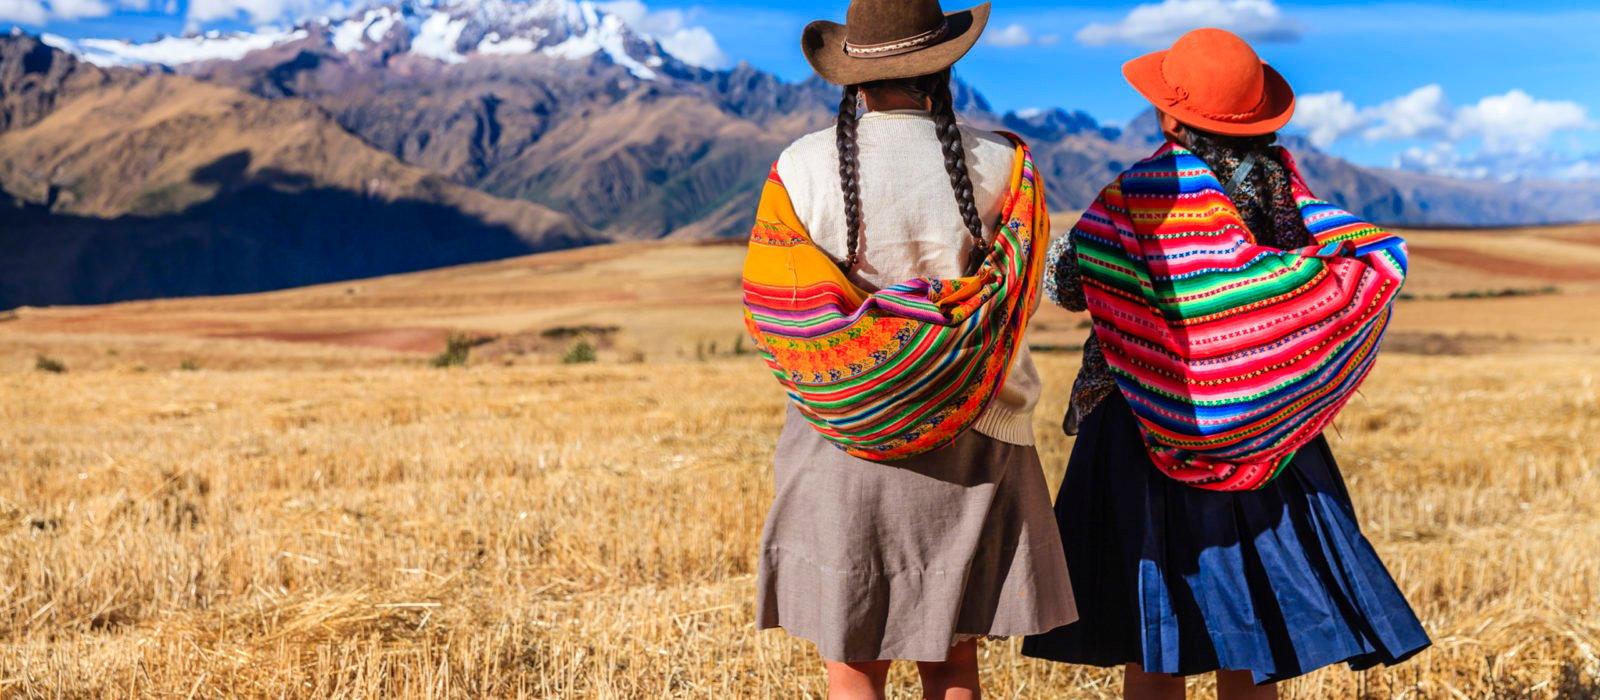 peruvian-women-national-dress-sacred-valley